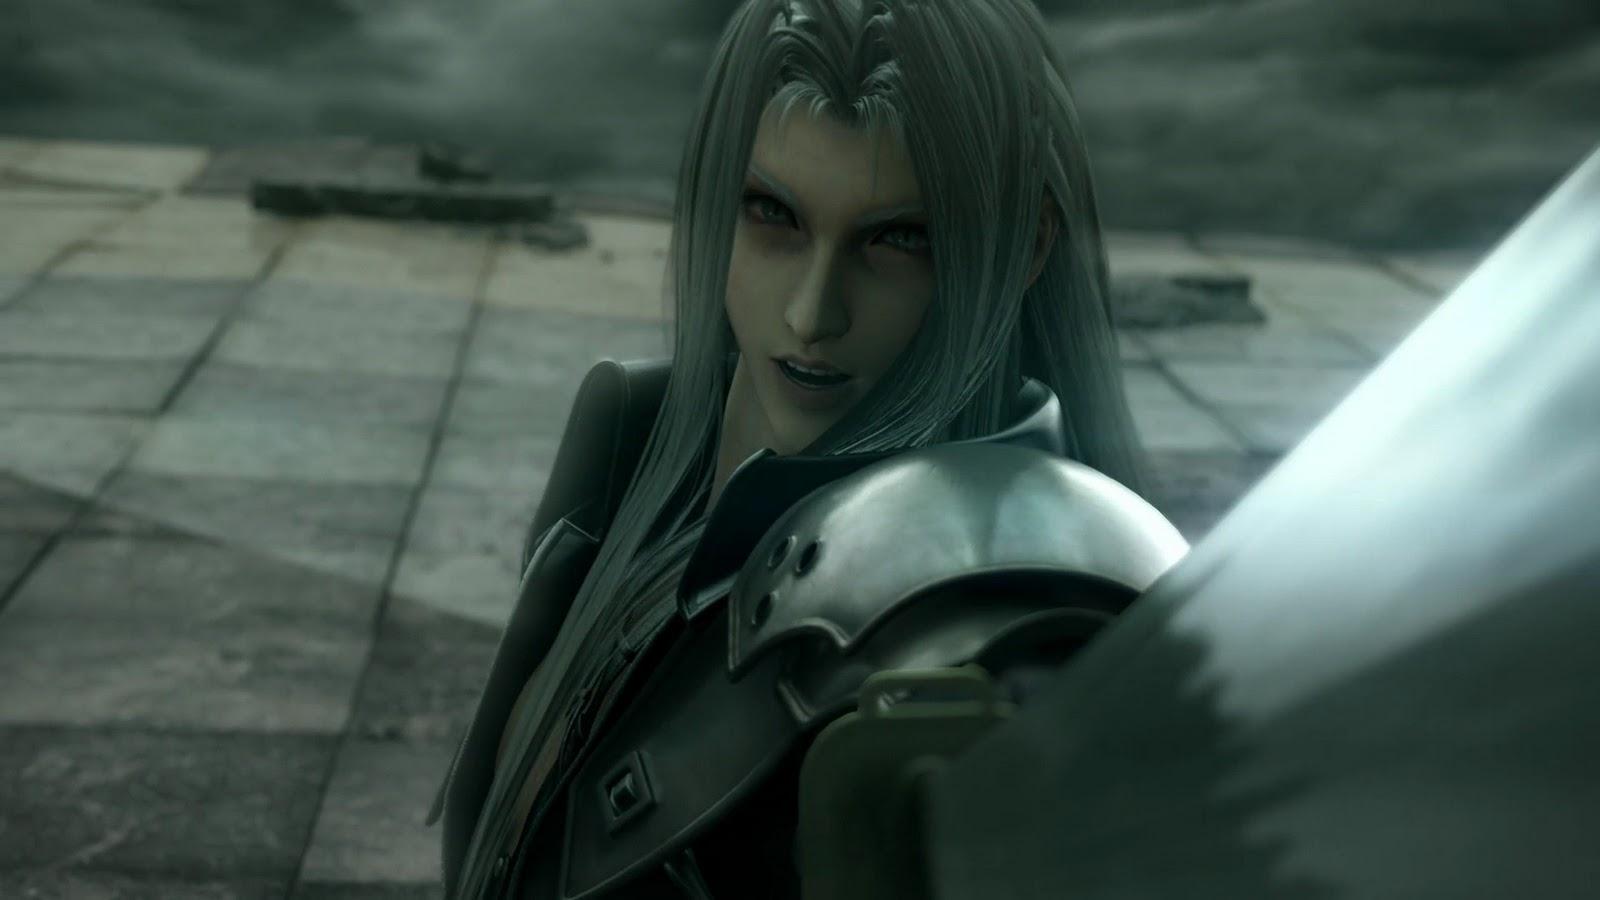 Final Fantasy 7 Wallpaper Qhd Wallpapers